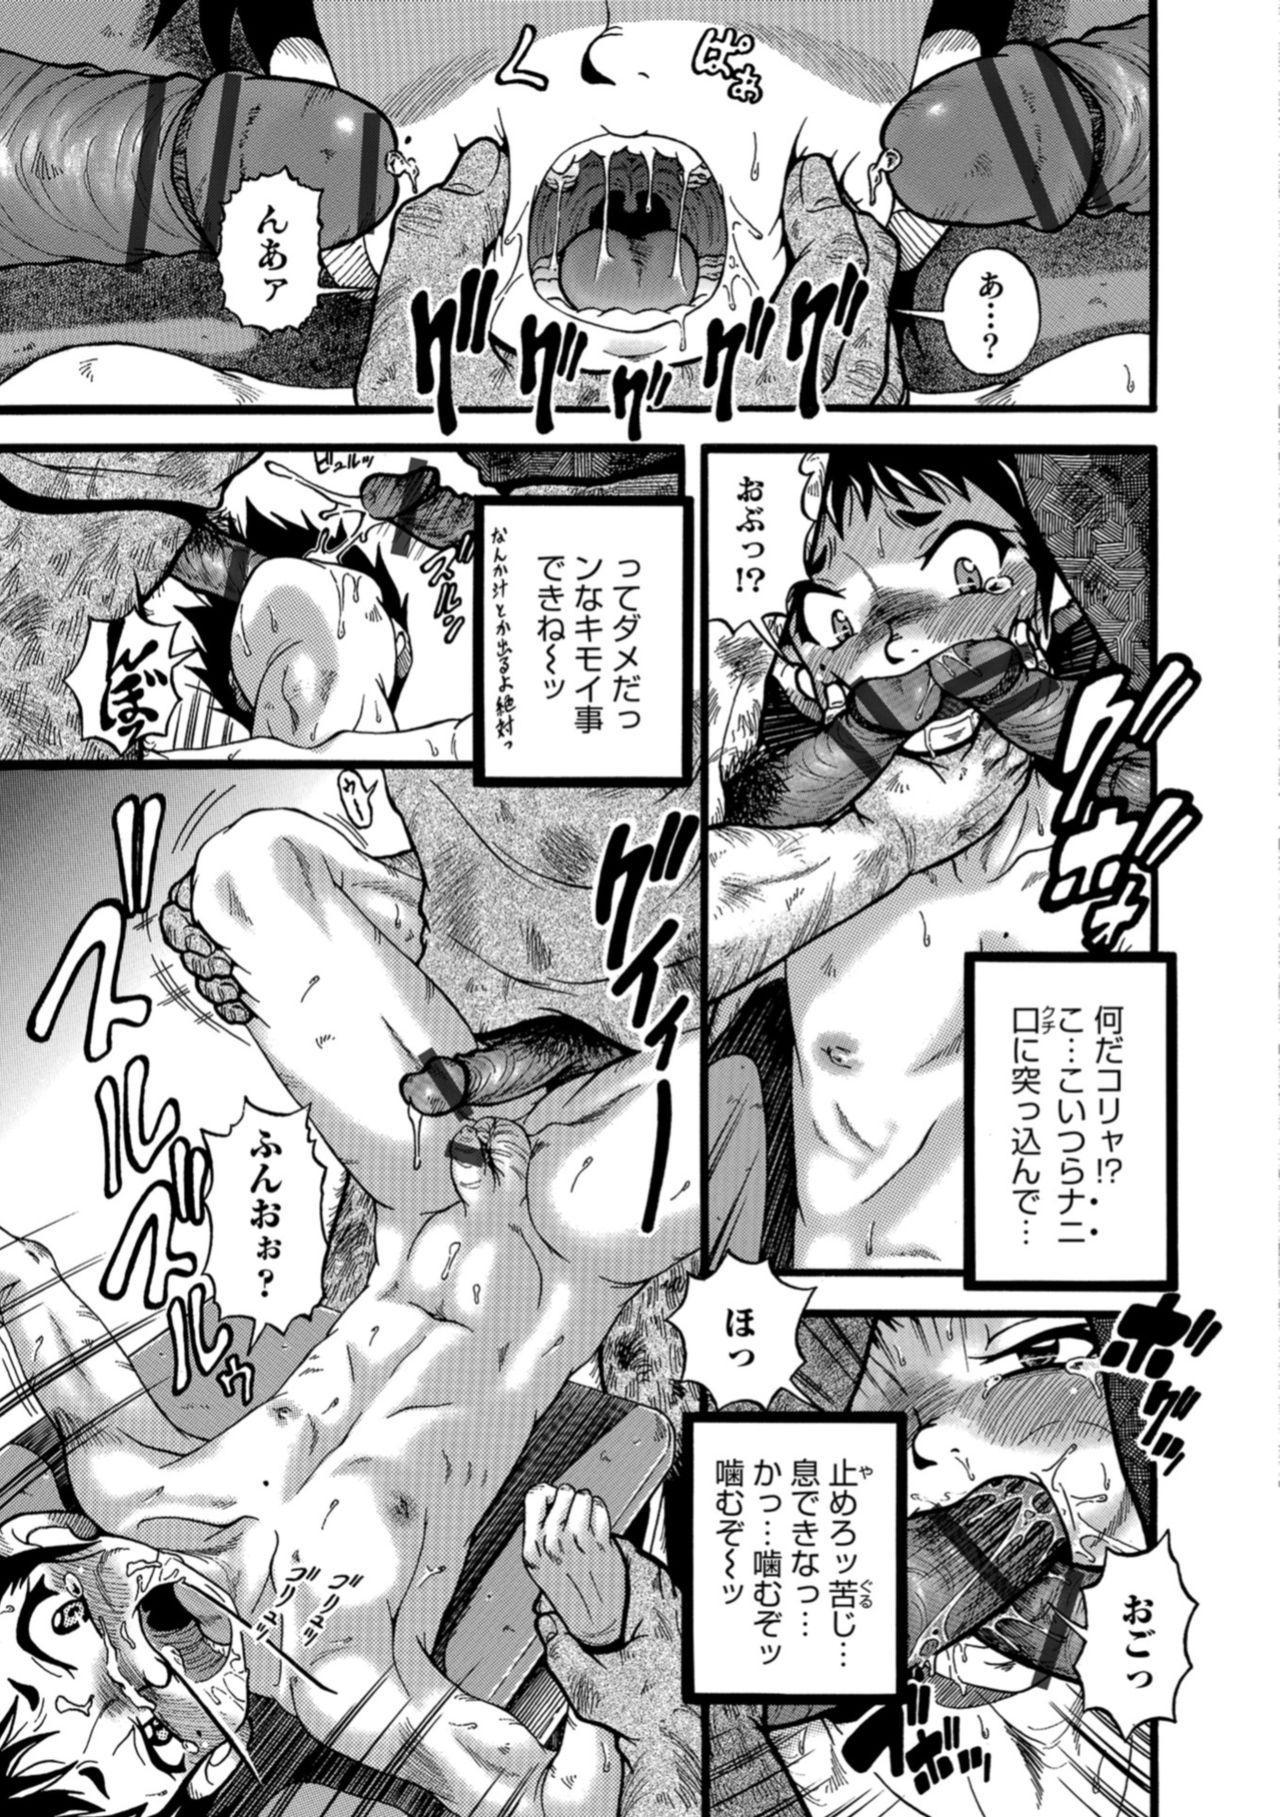 Otokonoko HELL'S GATE #03 158